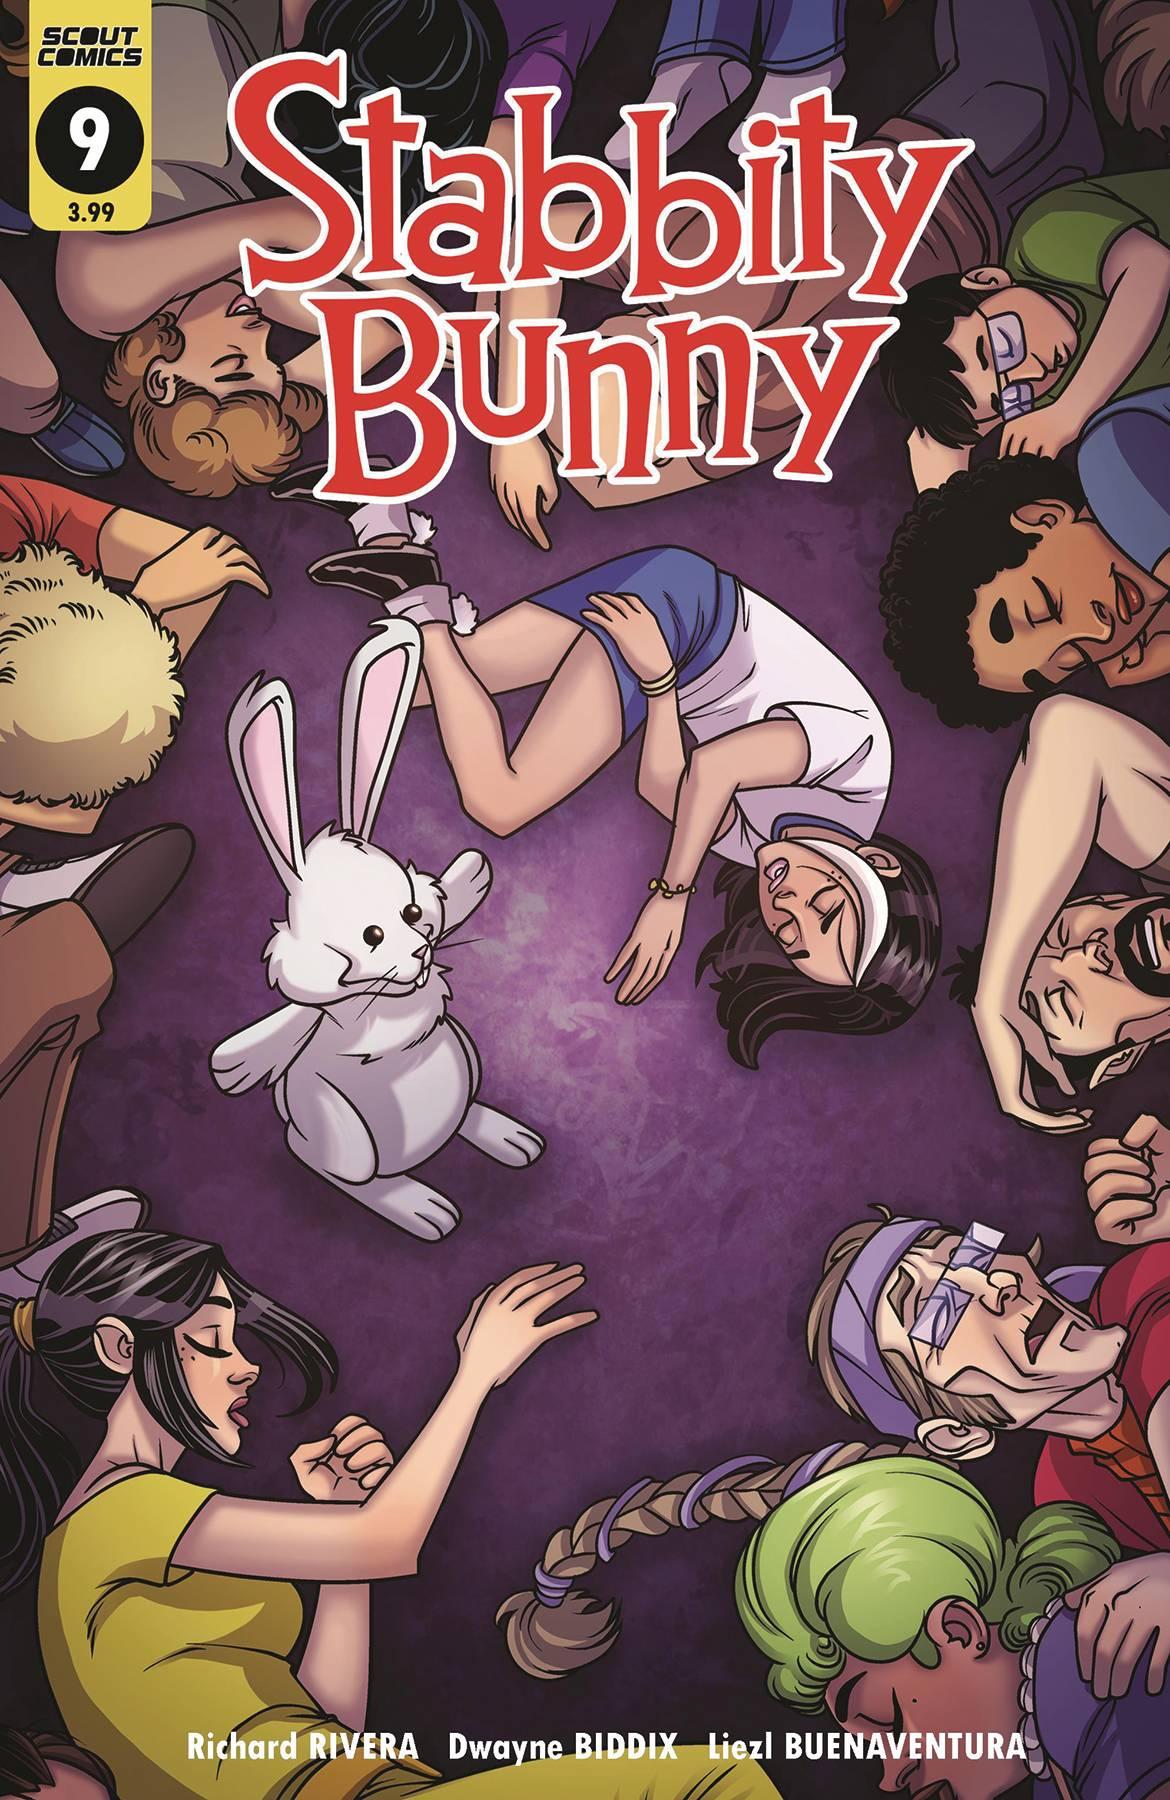 Stabbity Bunny #9 (2020)